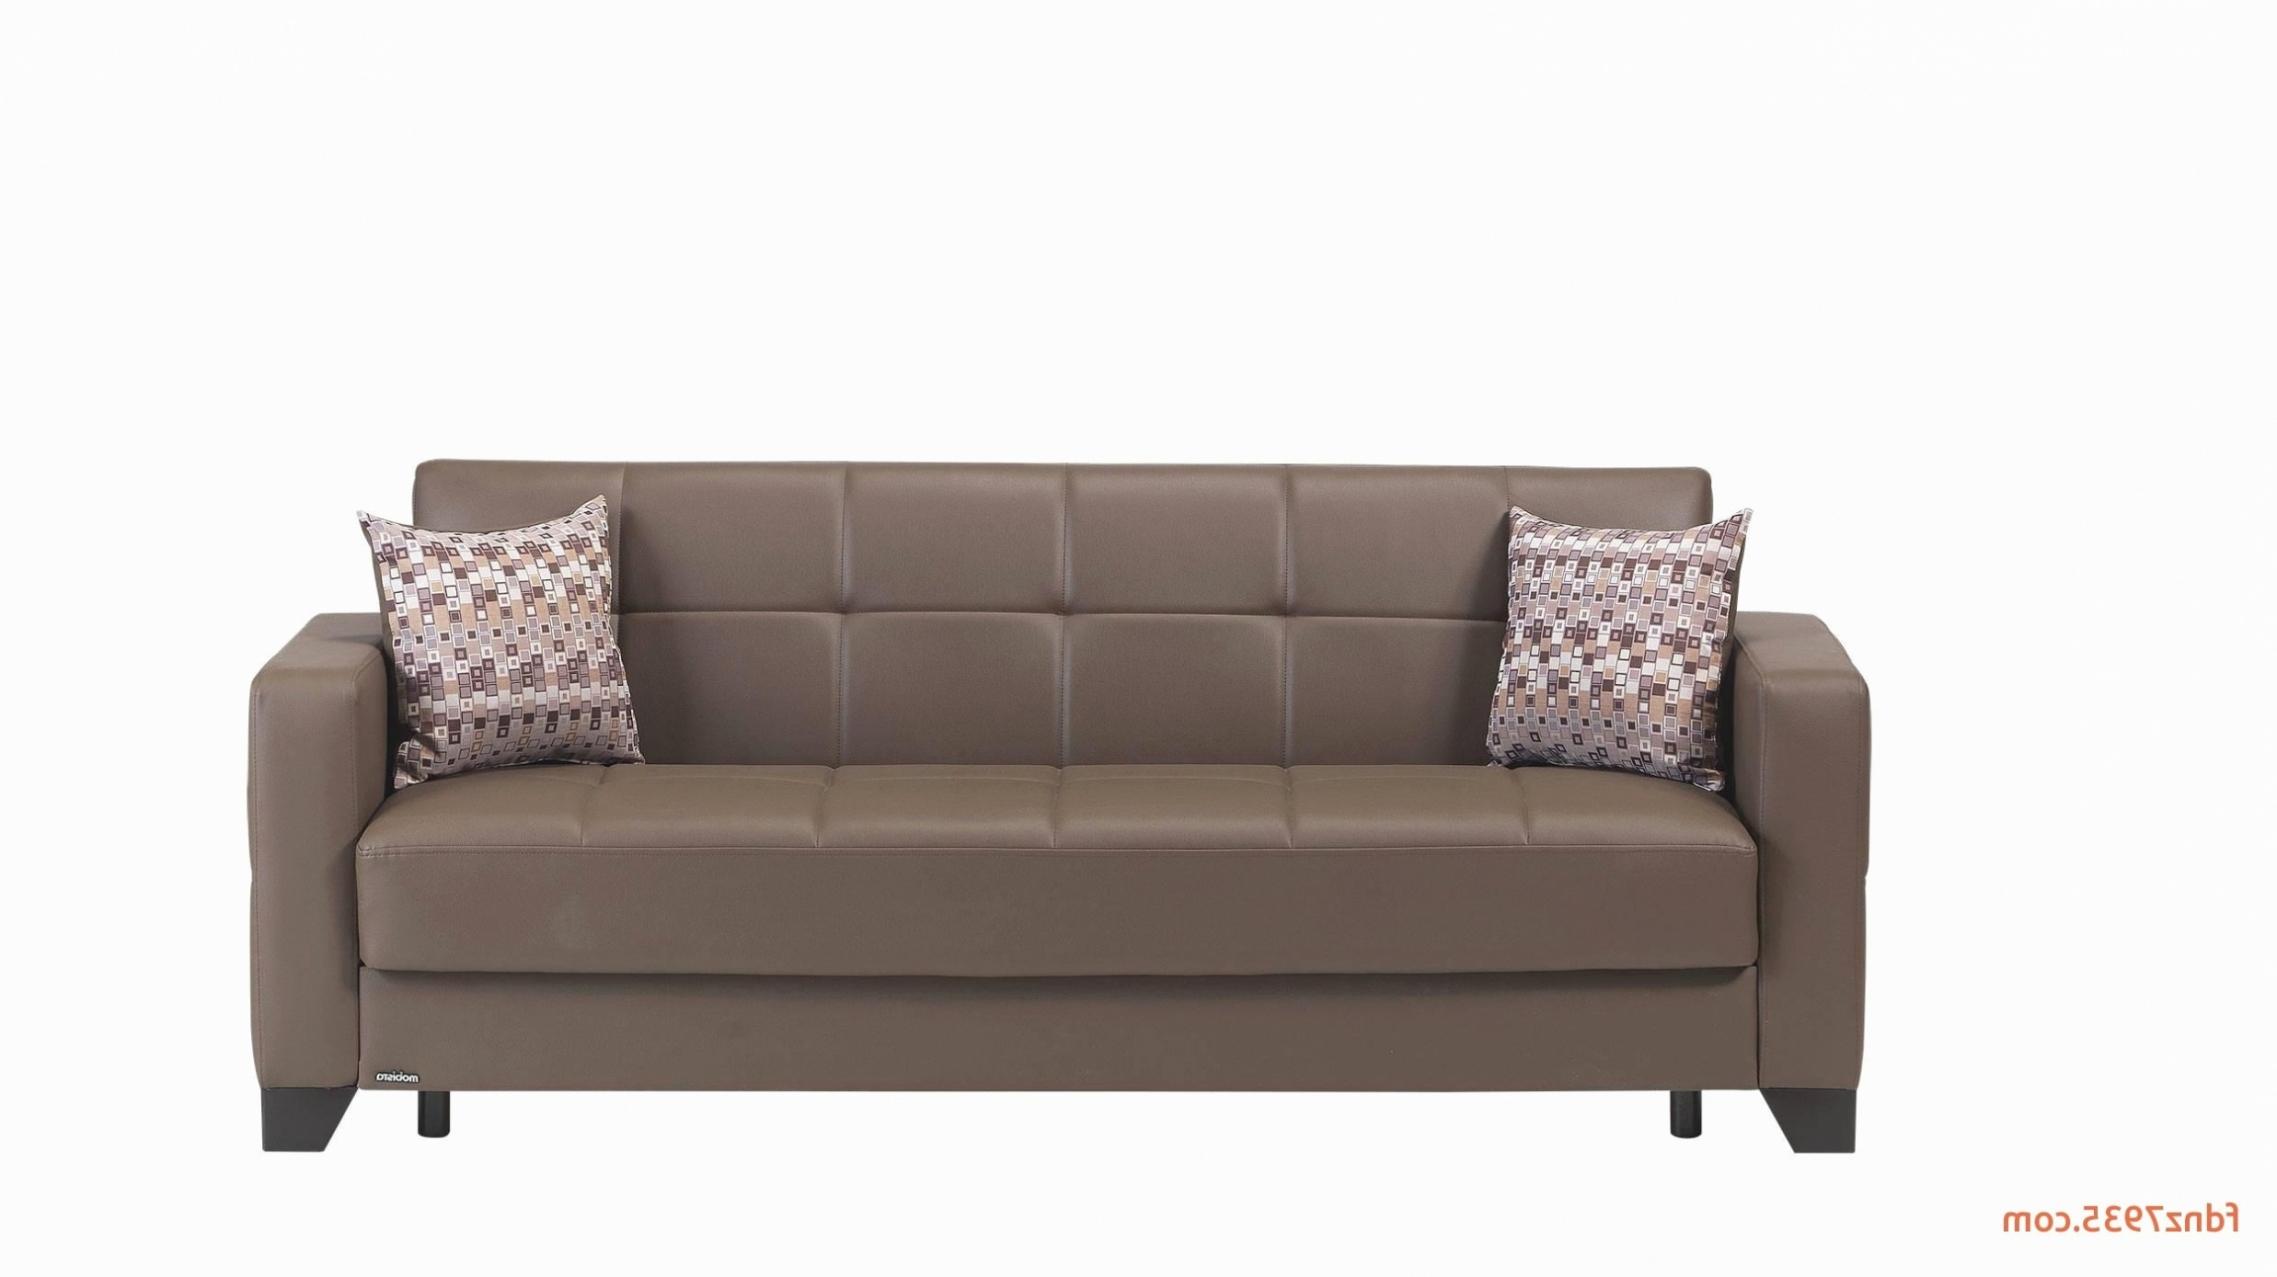 Fundas sofa Corte Ingles S5d8 Blend sofas En El Corte Ingles Blendiberia Fiesta De Lamusica